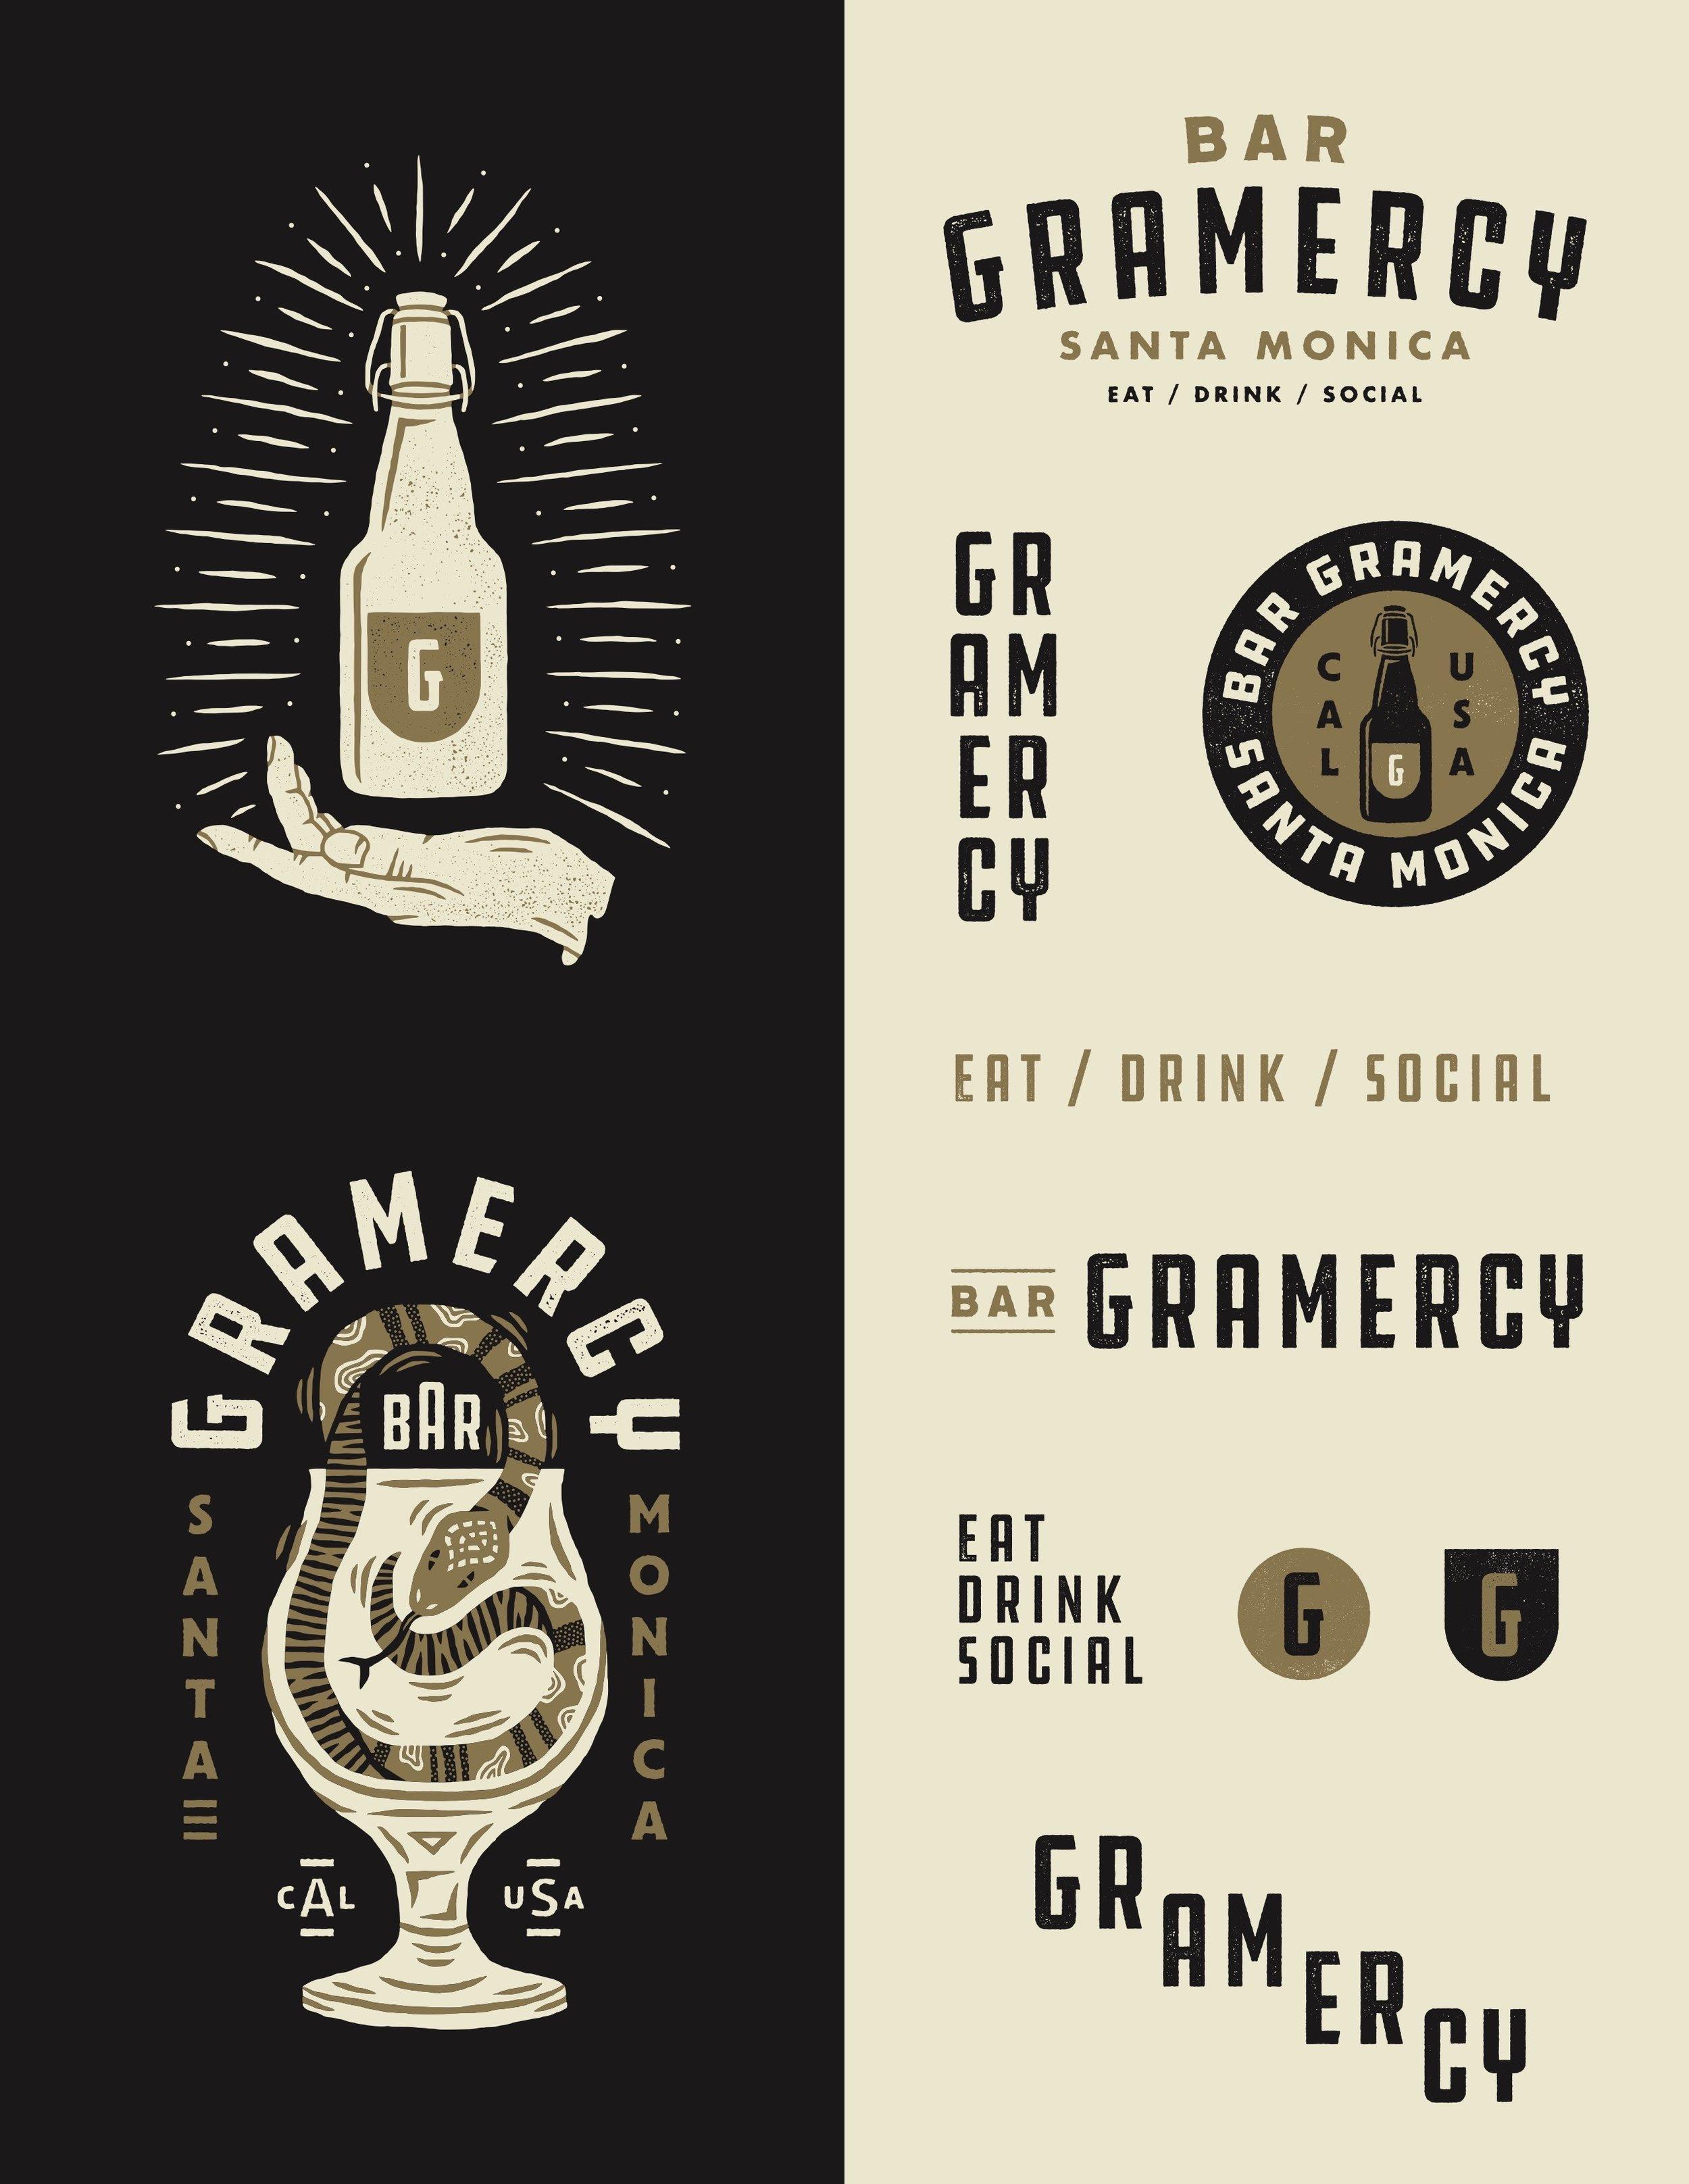 Gramercy-FINAL copy copy.jpg